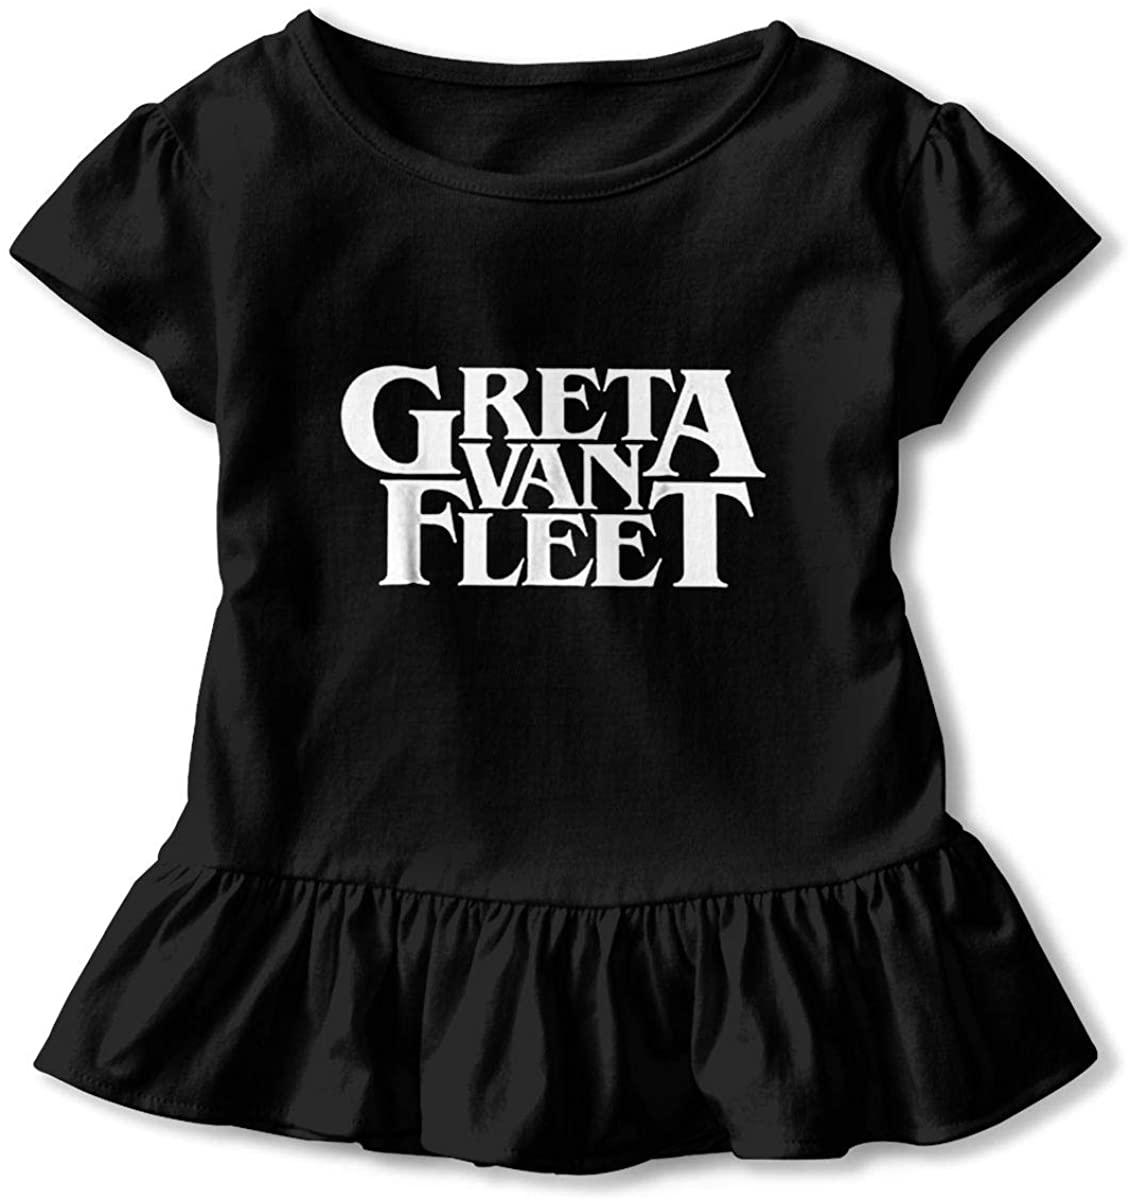 Greta Van Fleet Toddler Girl's Ruffle T-Shirt Short Sleeve 2-6t